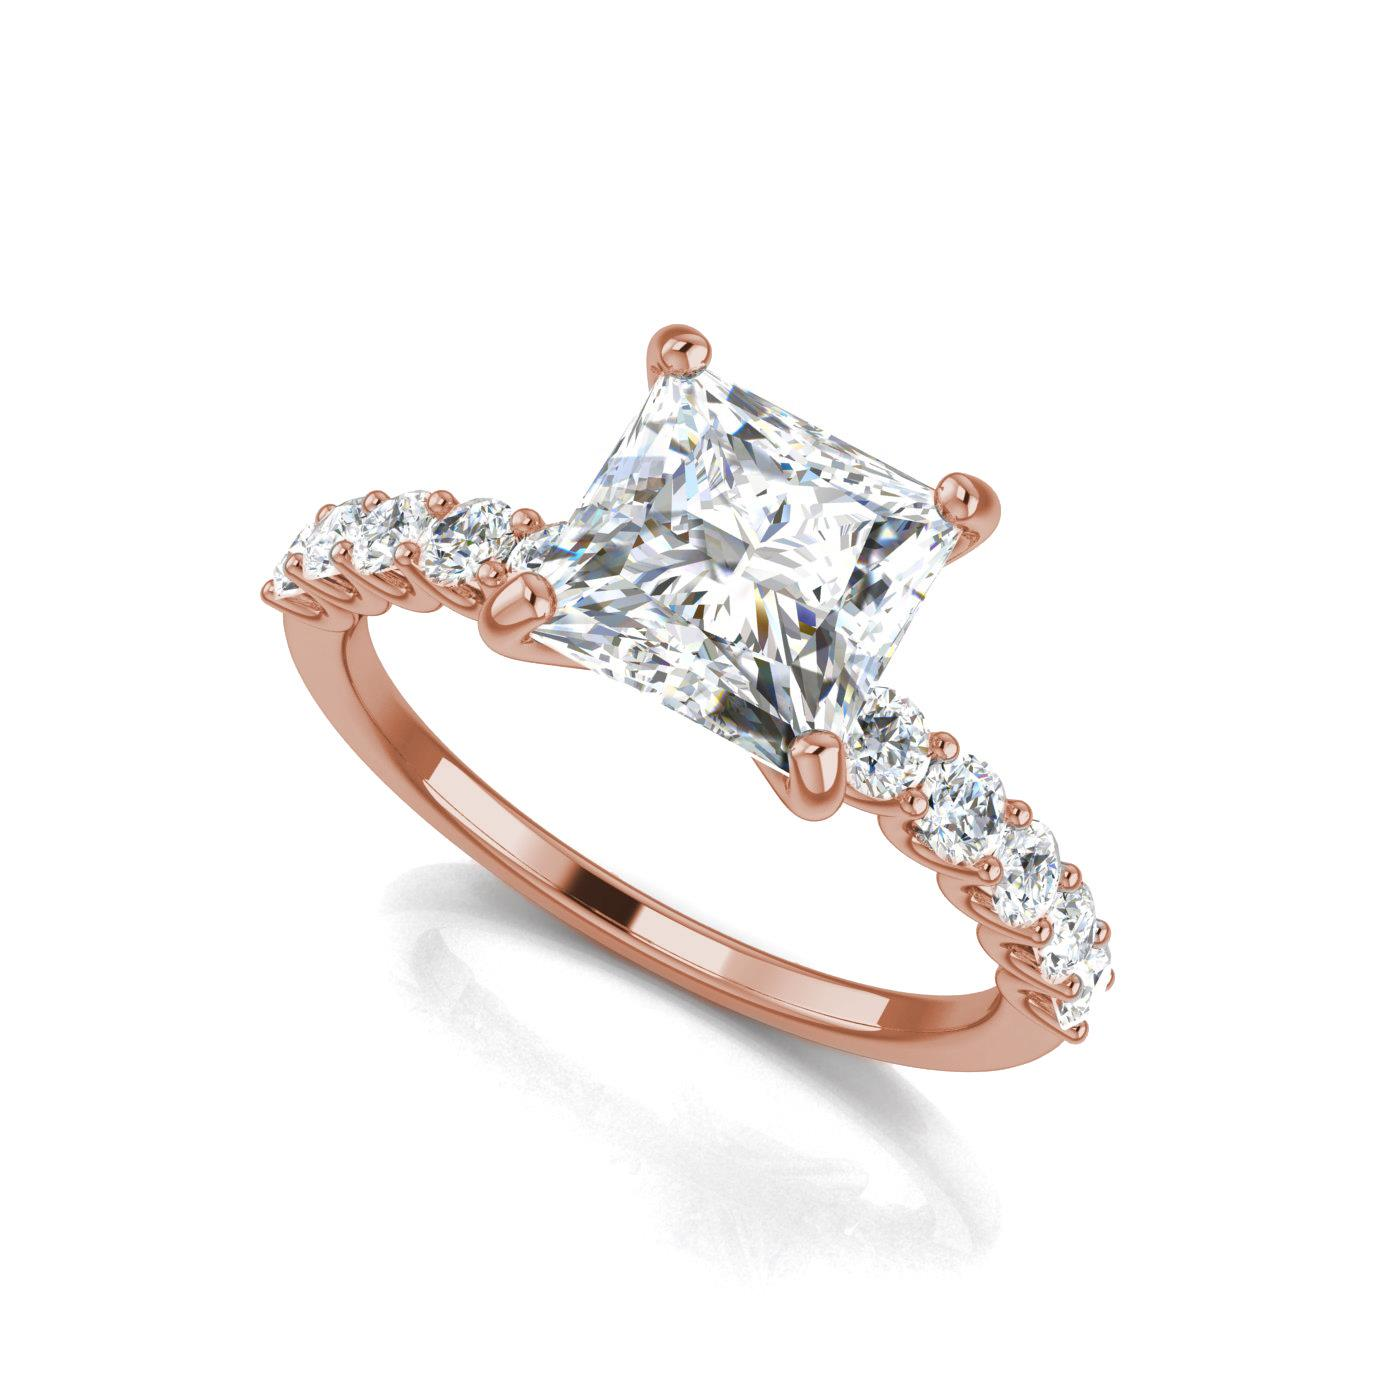 2 5 Carat Princess Cut Diamond Engagement Ring Vs2 H Ebay